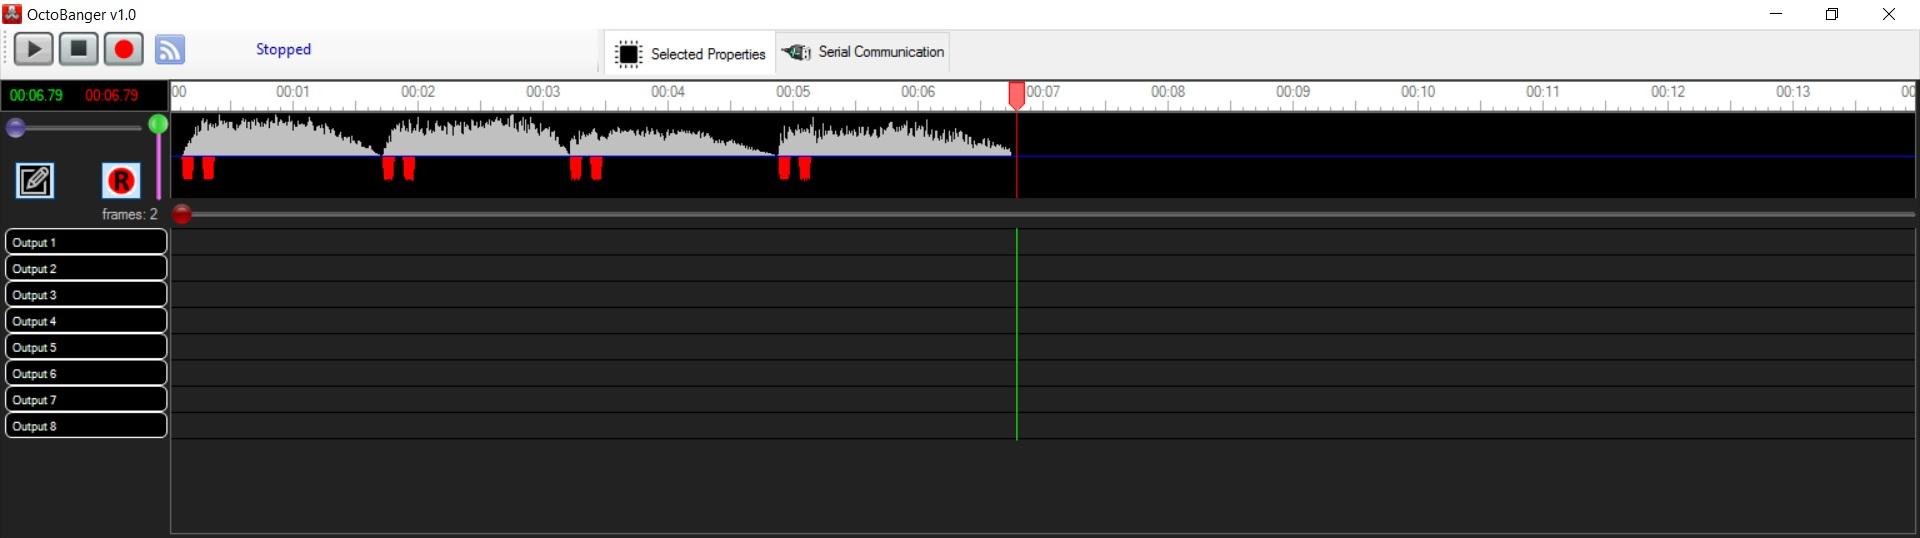 Hybrid Video Player Controller Relay Decoder Dtmf Using Mt8870de Heres What The Monster Soundtrack Looks Like In Octobanger